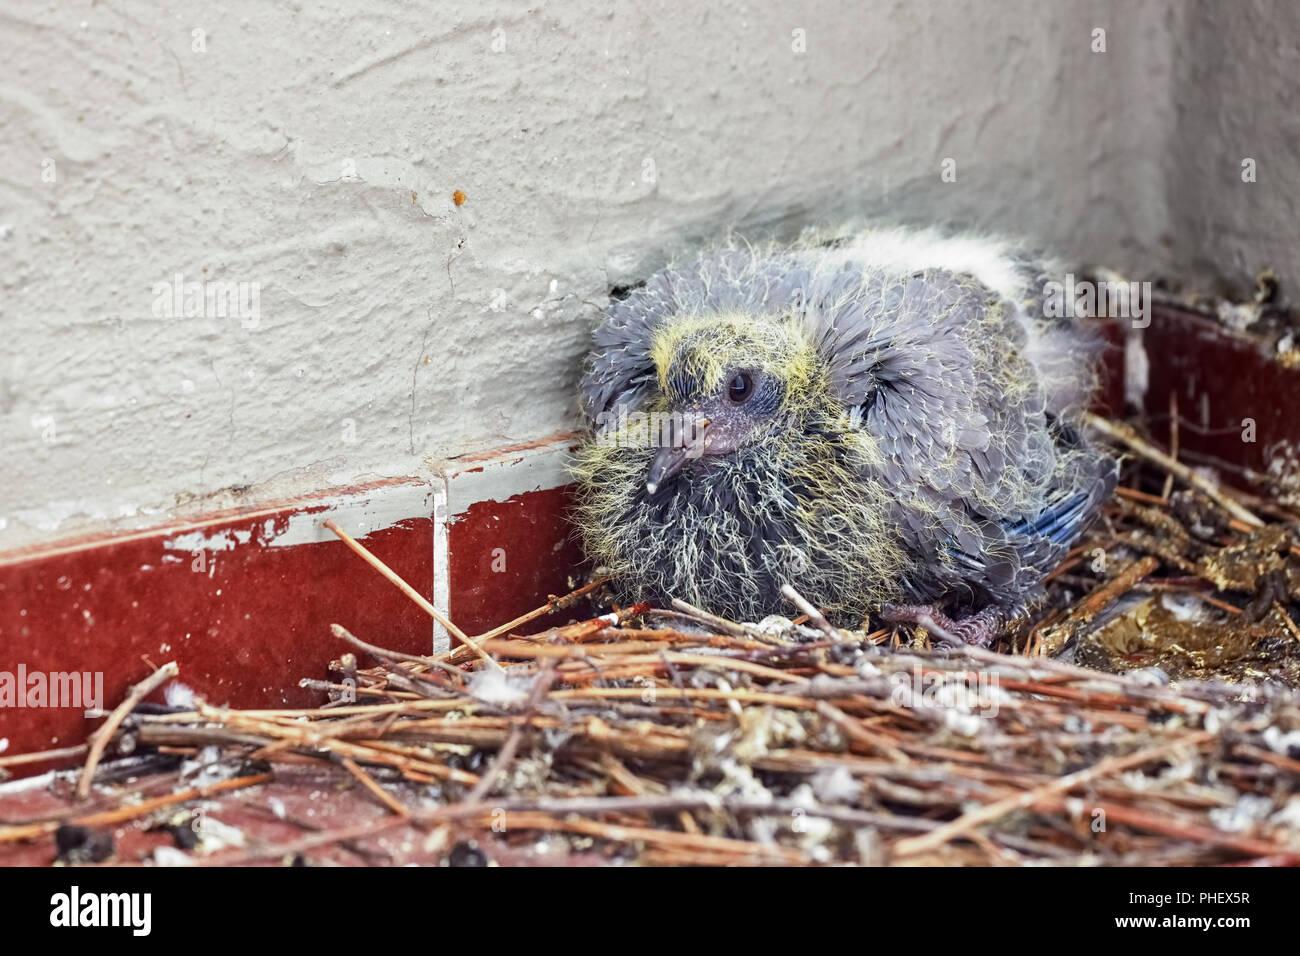 Nido Di Tortore Sul Balcone pigeon egg immagini & pigeon egg fotos stock - alamy